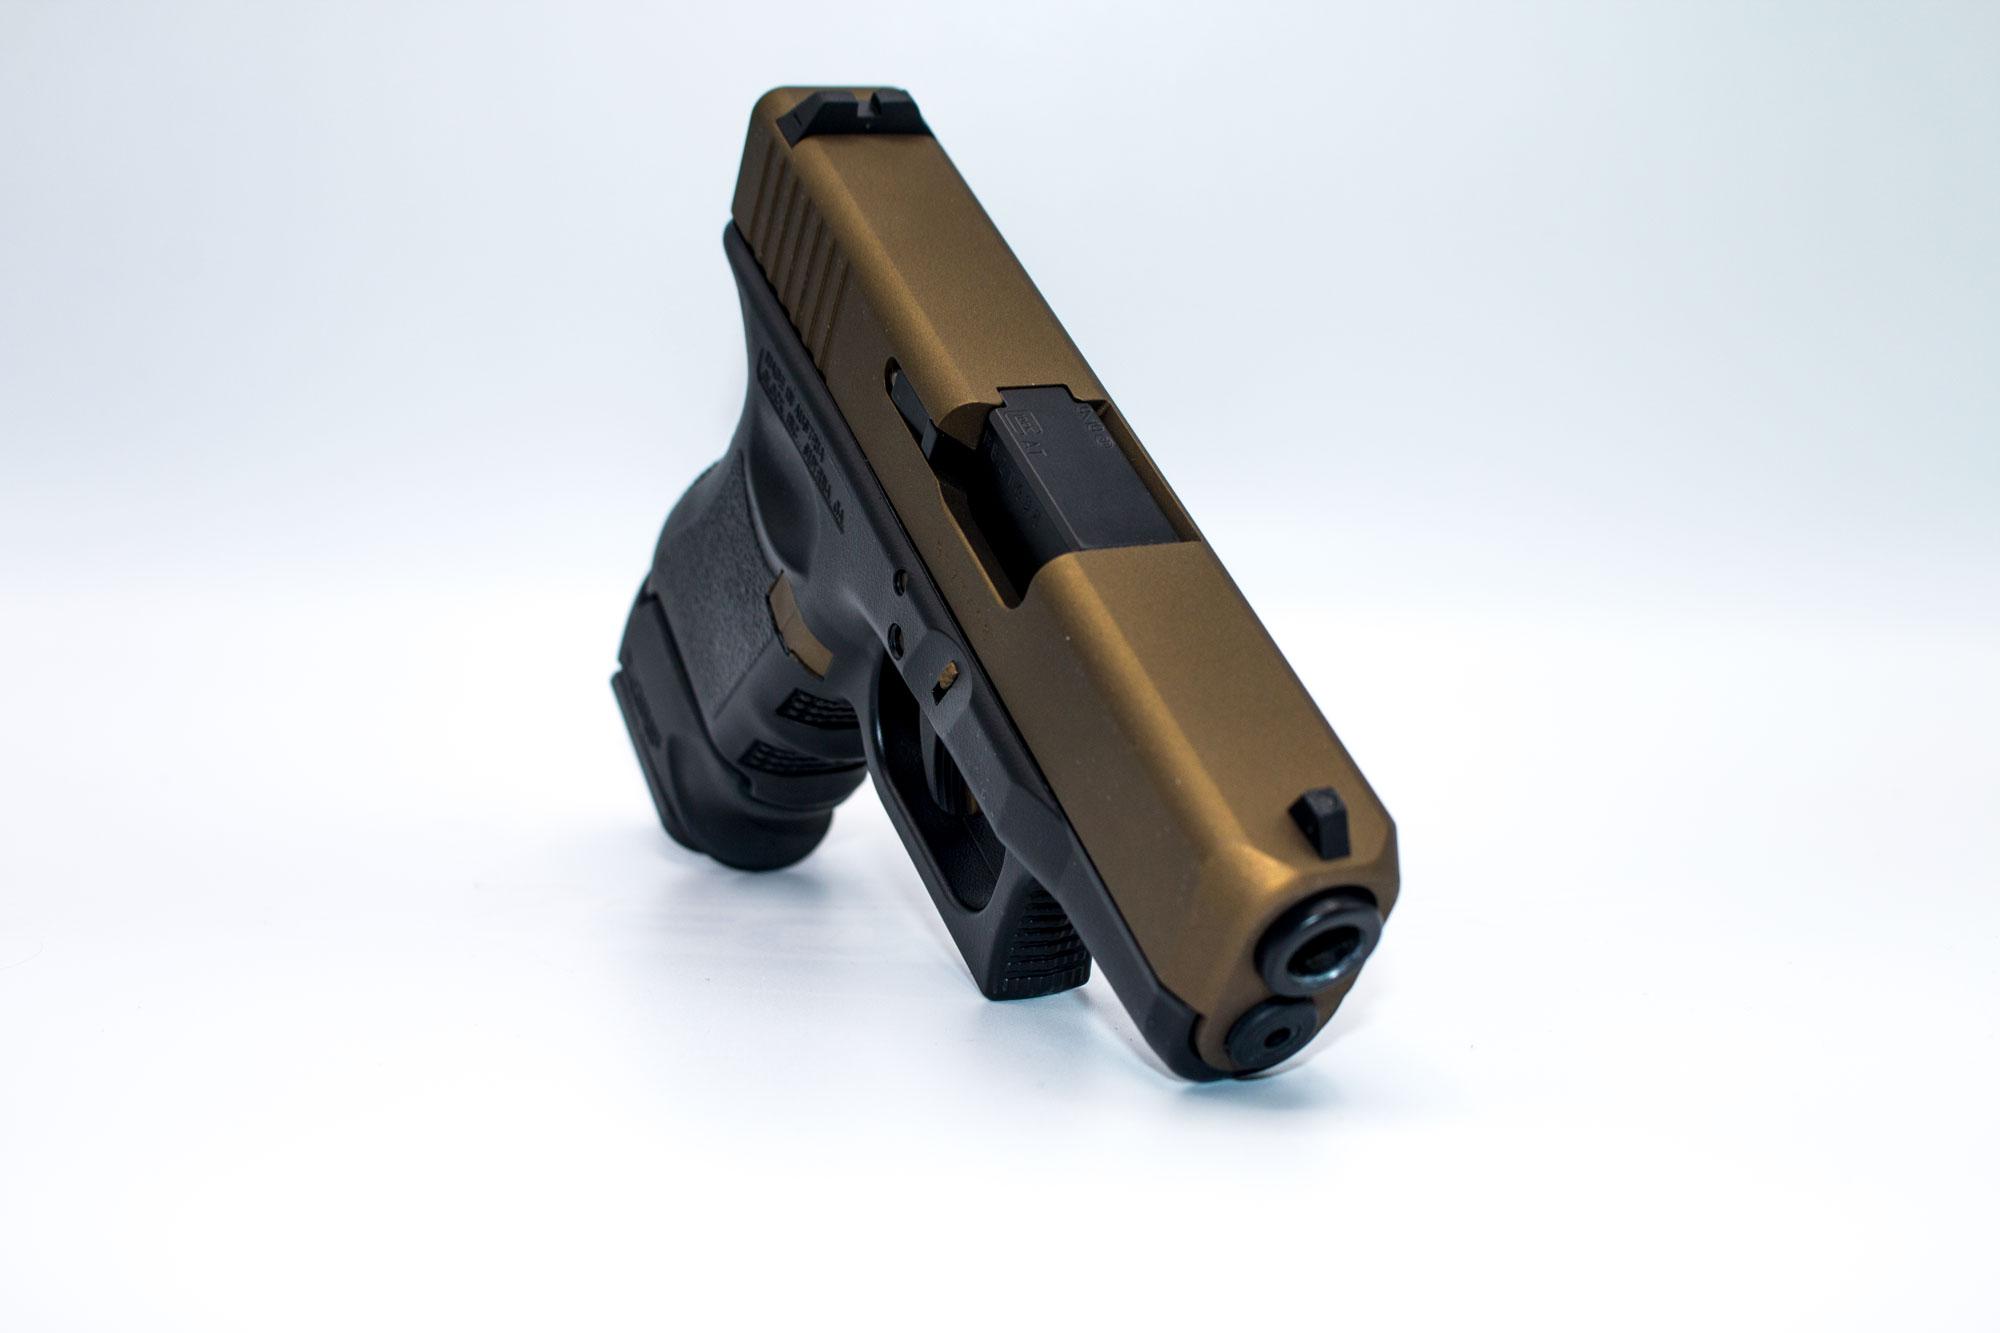 Ryan-bronze-glock-front-view-MEDIUM.jpg